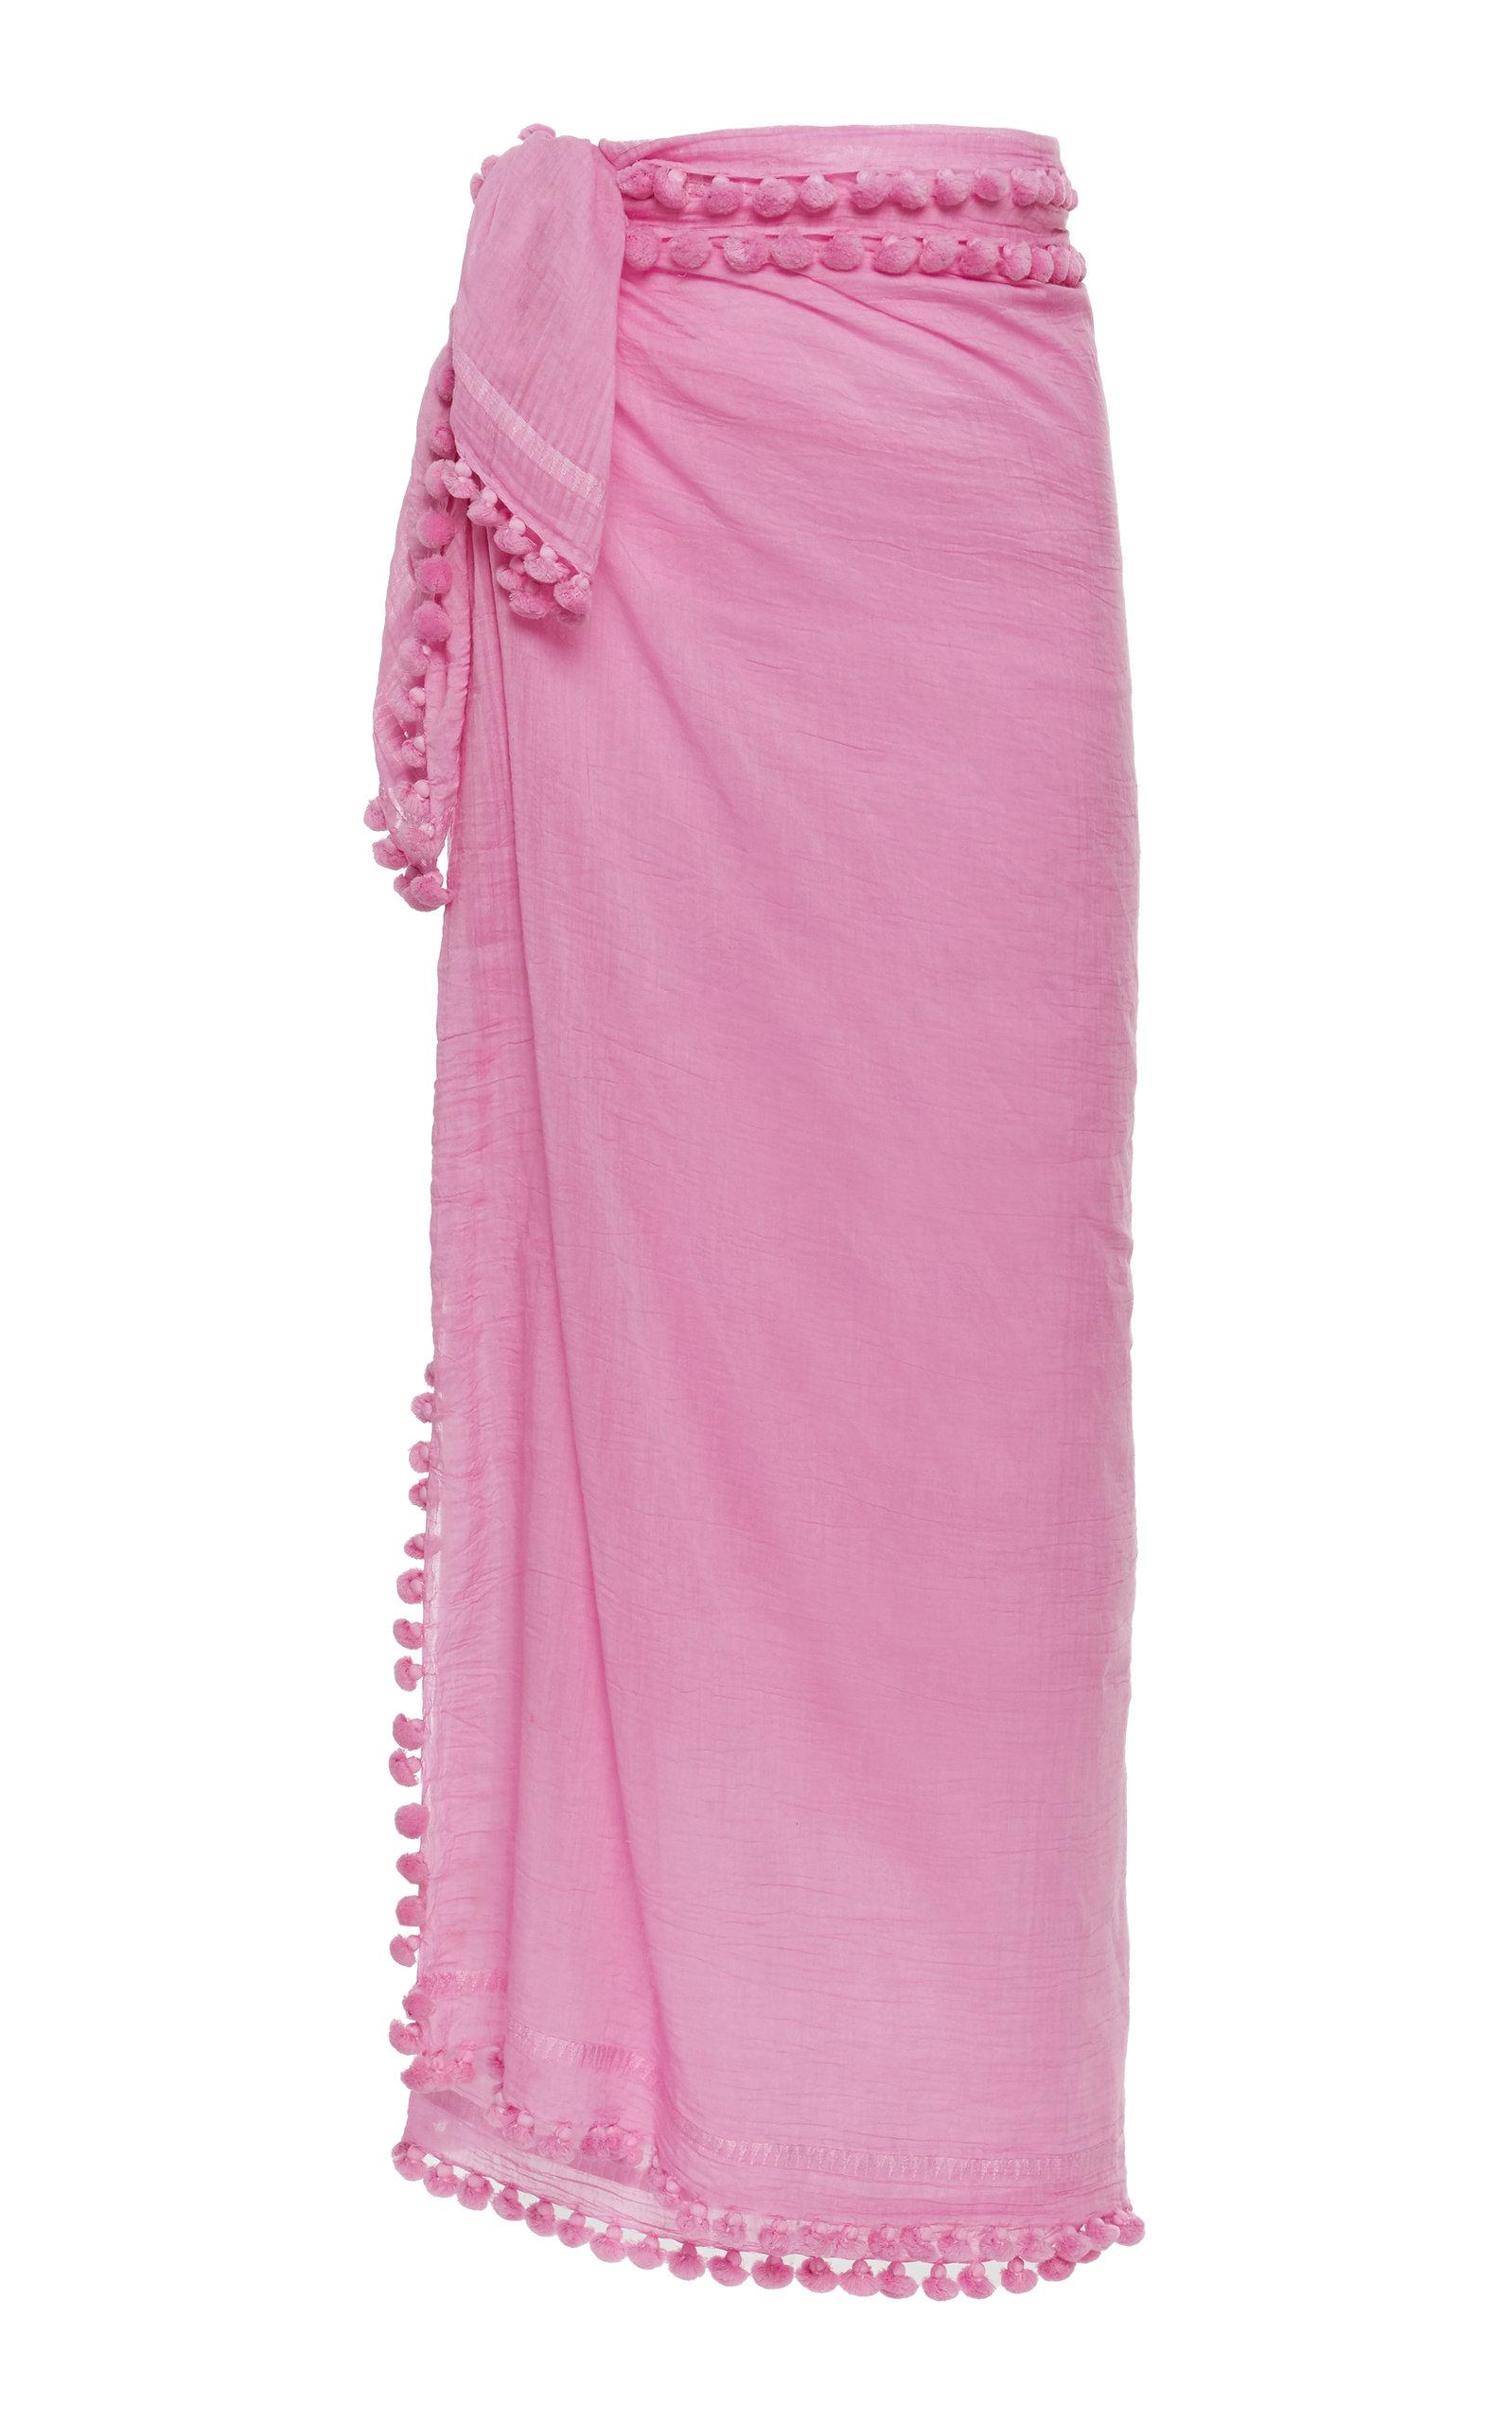 MATTA Dupatta Tasseled Cotton And Silk Shawl in Pink